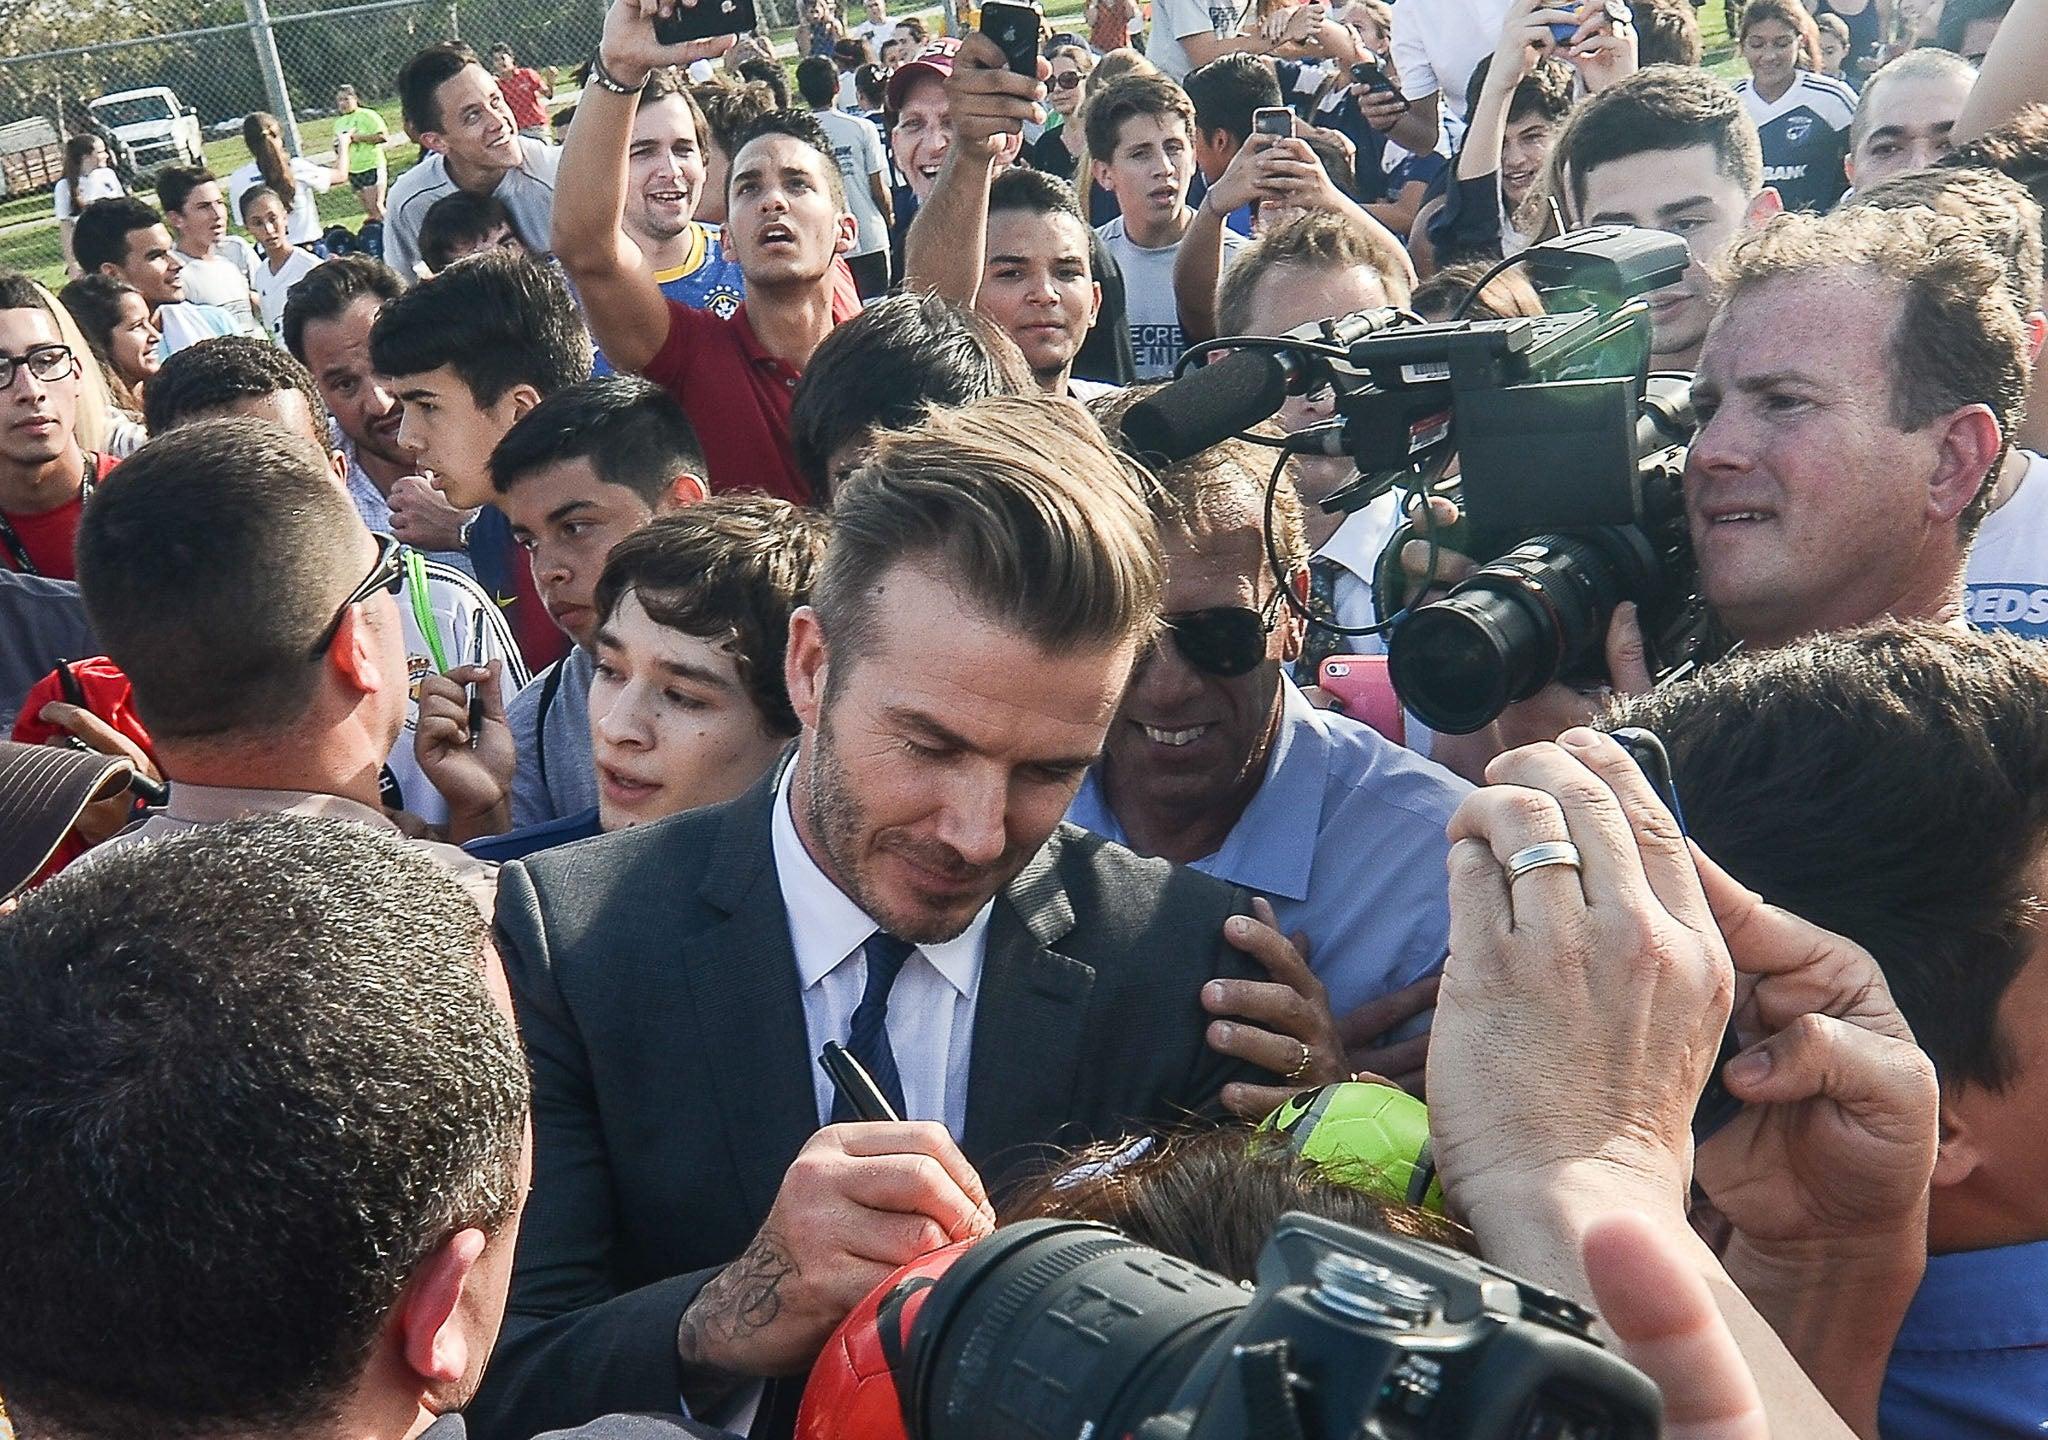 David Beckham Mobbed Frightening Footage Of Fan Crush As Star